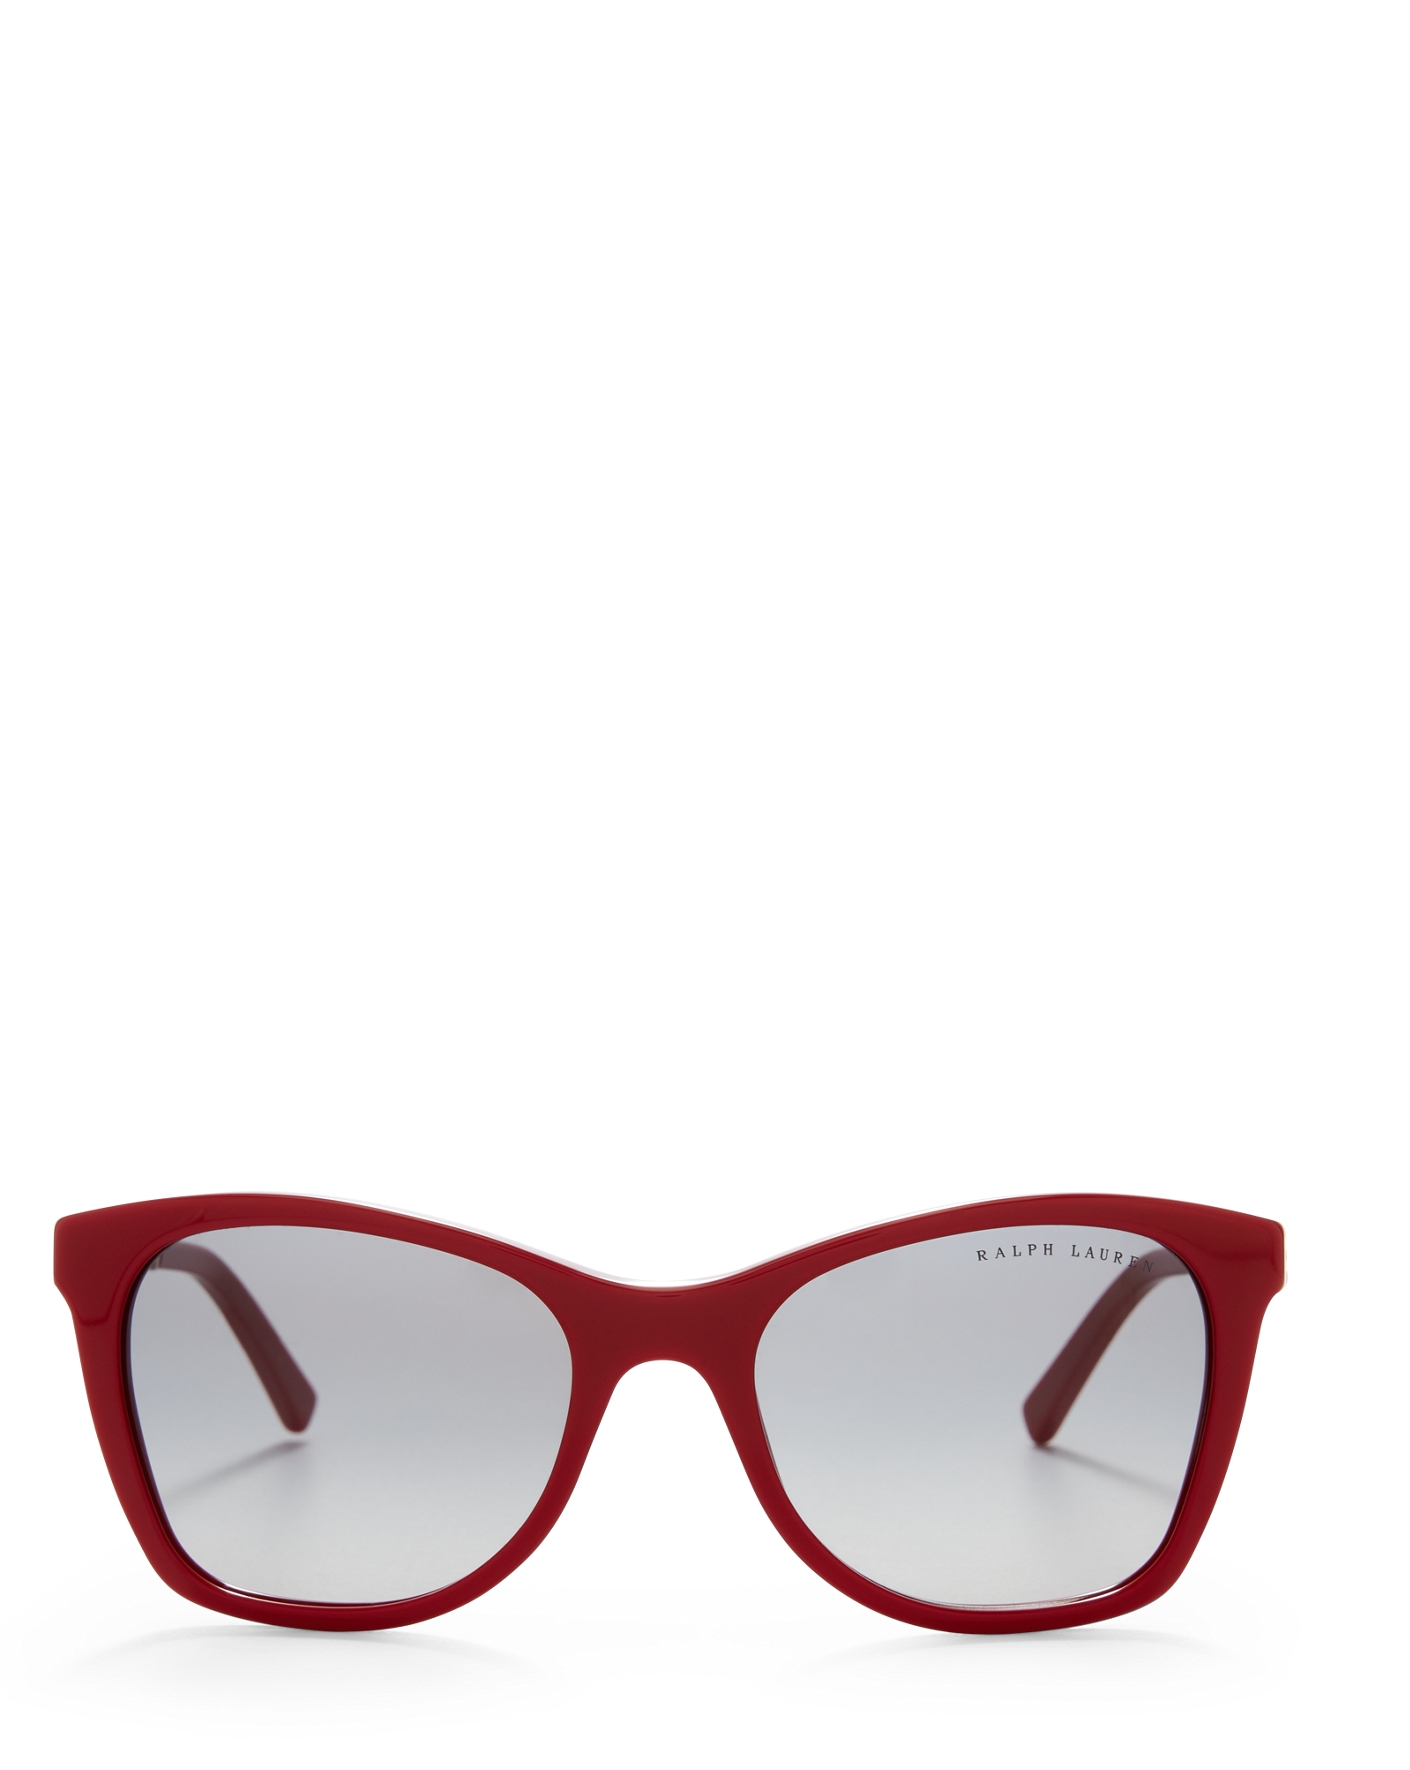 Shop The Best Deals For May 2017, ralph lauren sunglasses 135 ... 23969d7089